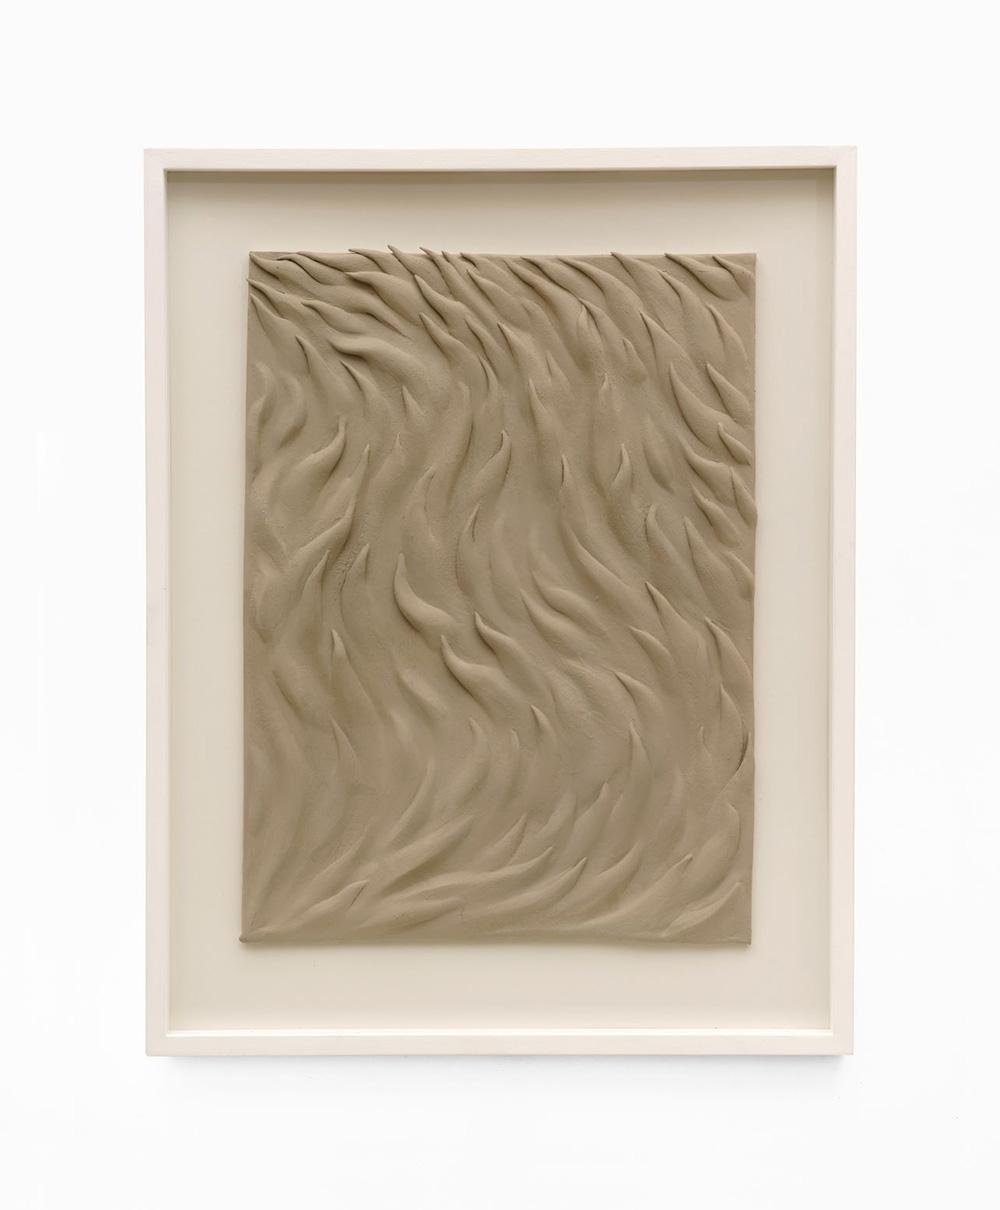 02_Riverscape (Keramik) Immanuel Birkert Riverscape (1), 2020 Öl auf Keramik